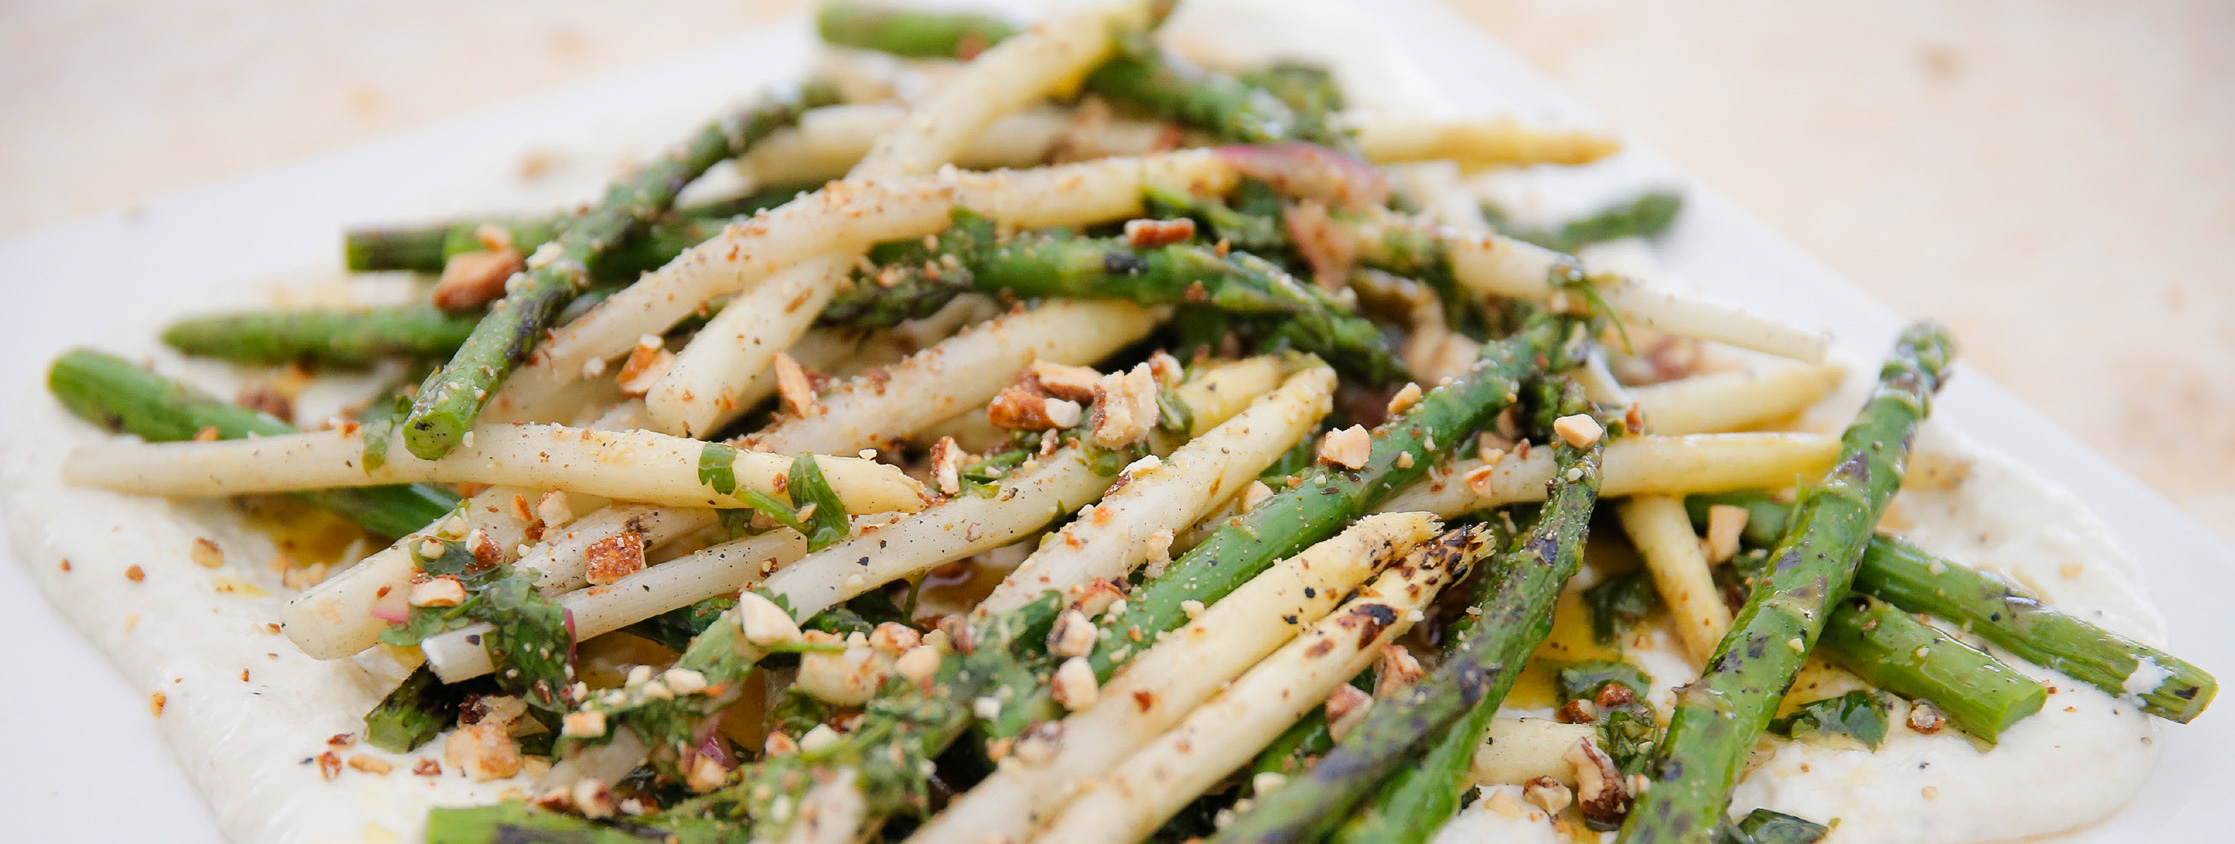 BobbySue's Nuts Asparagus Salad Recipe